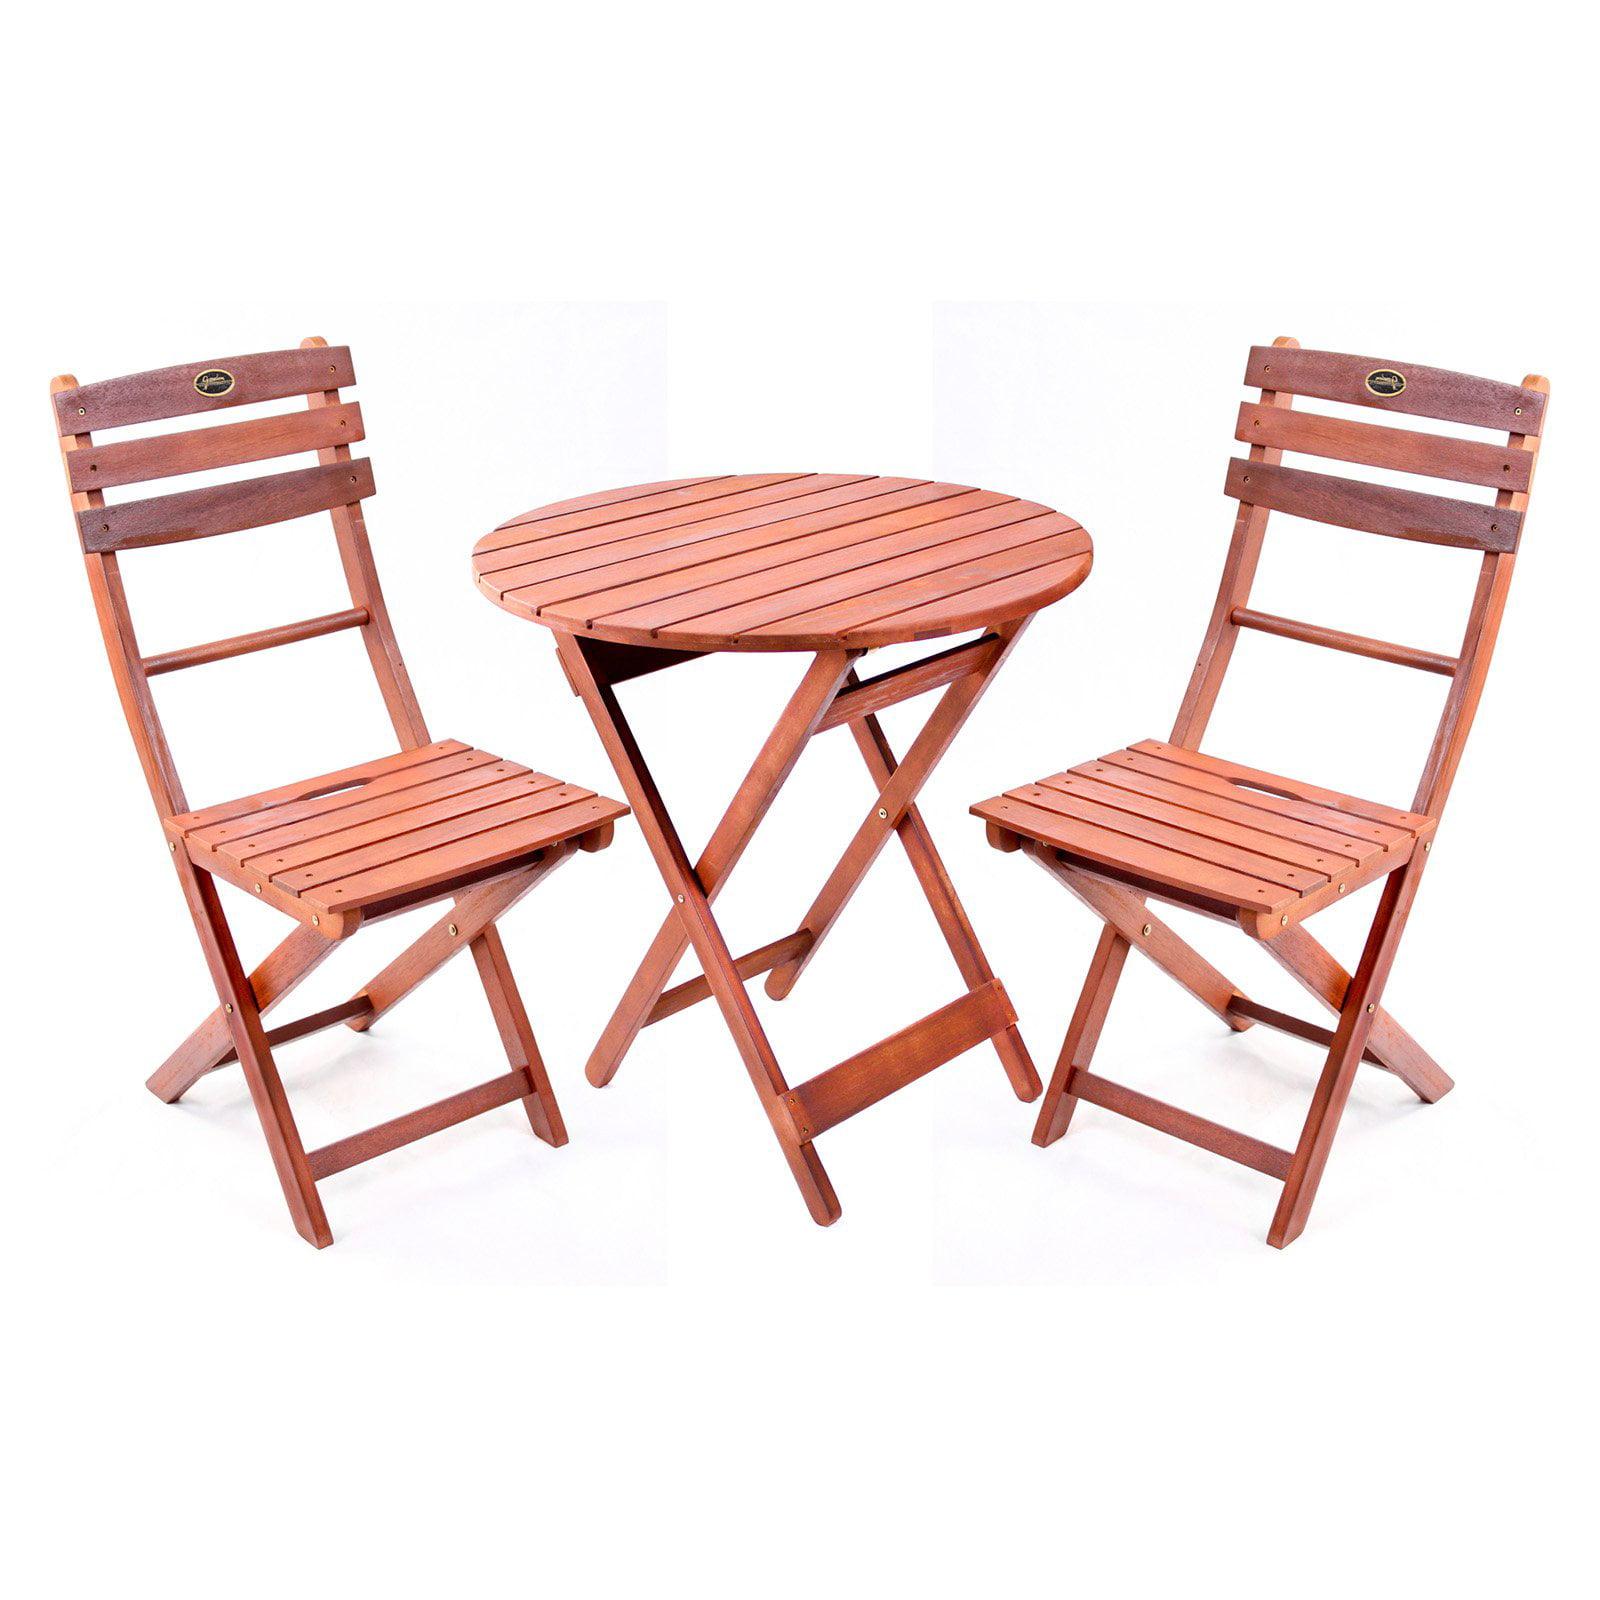 Wooden 3 Piece Bistro Set with Folding Chairs Walmart